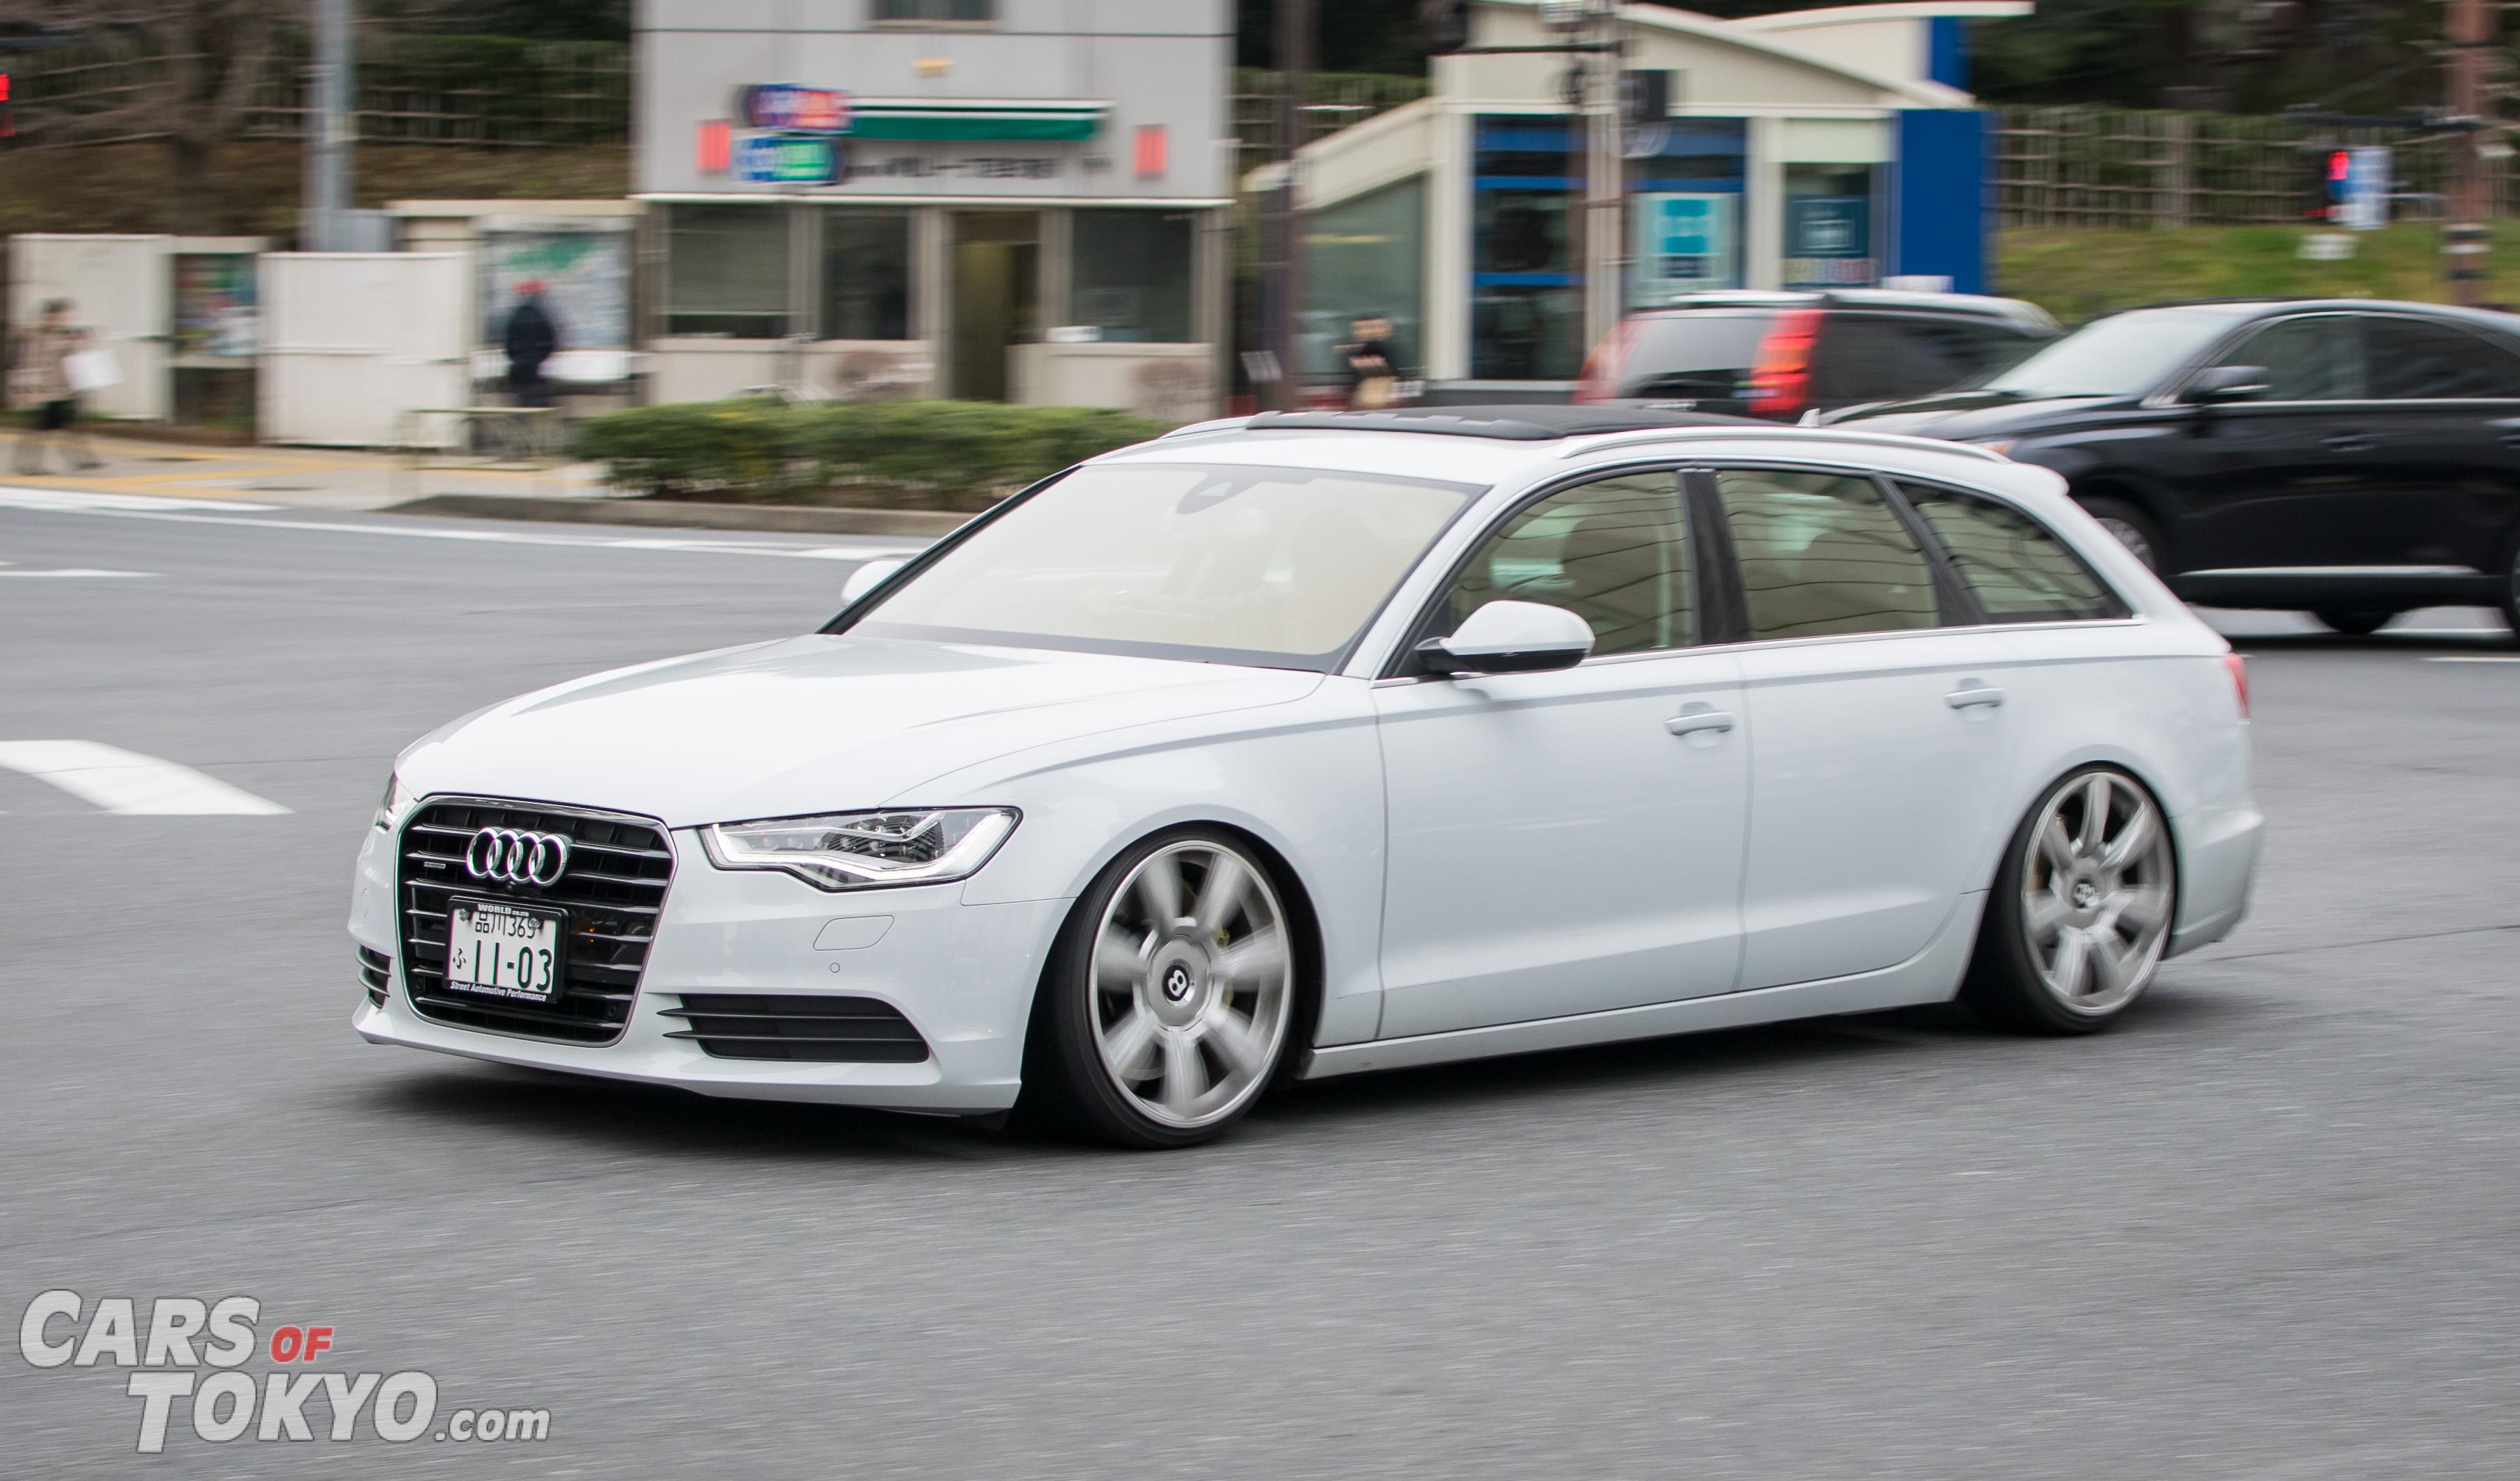 Cars of Tokyo Unusual Spec Audi A6